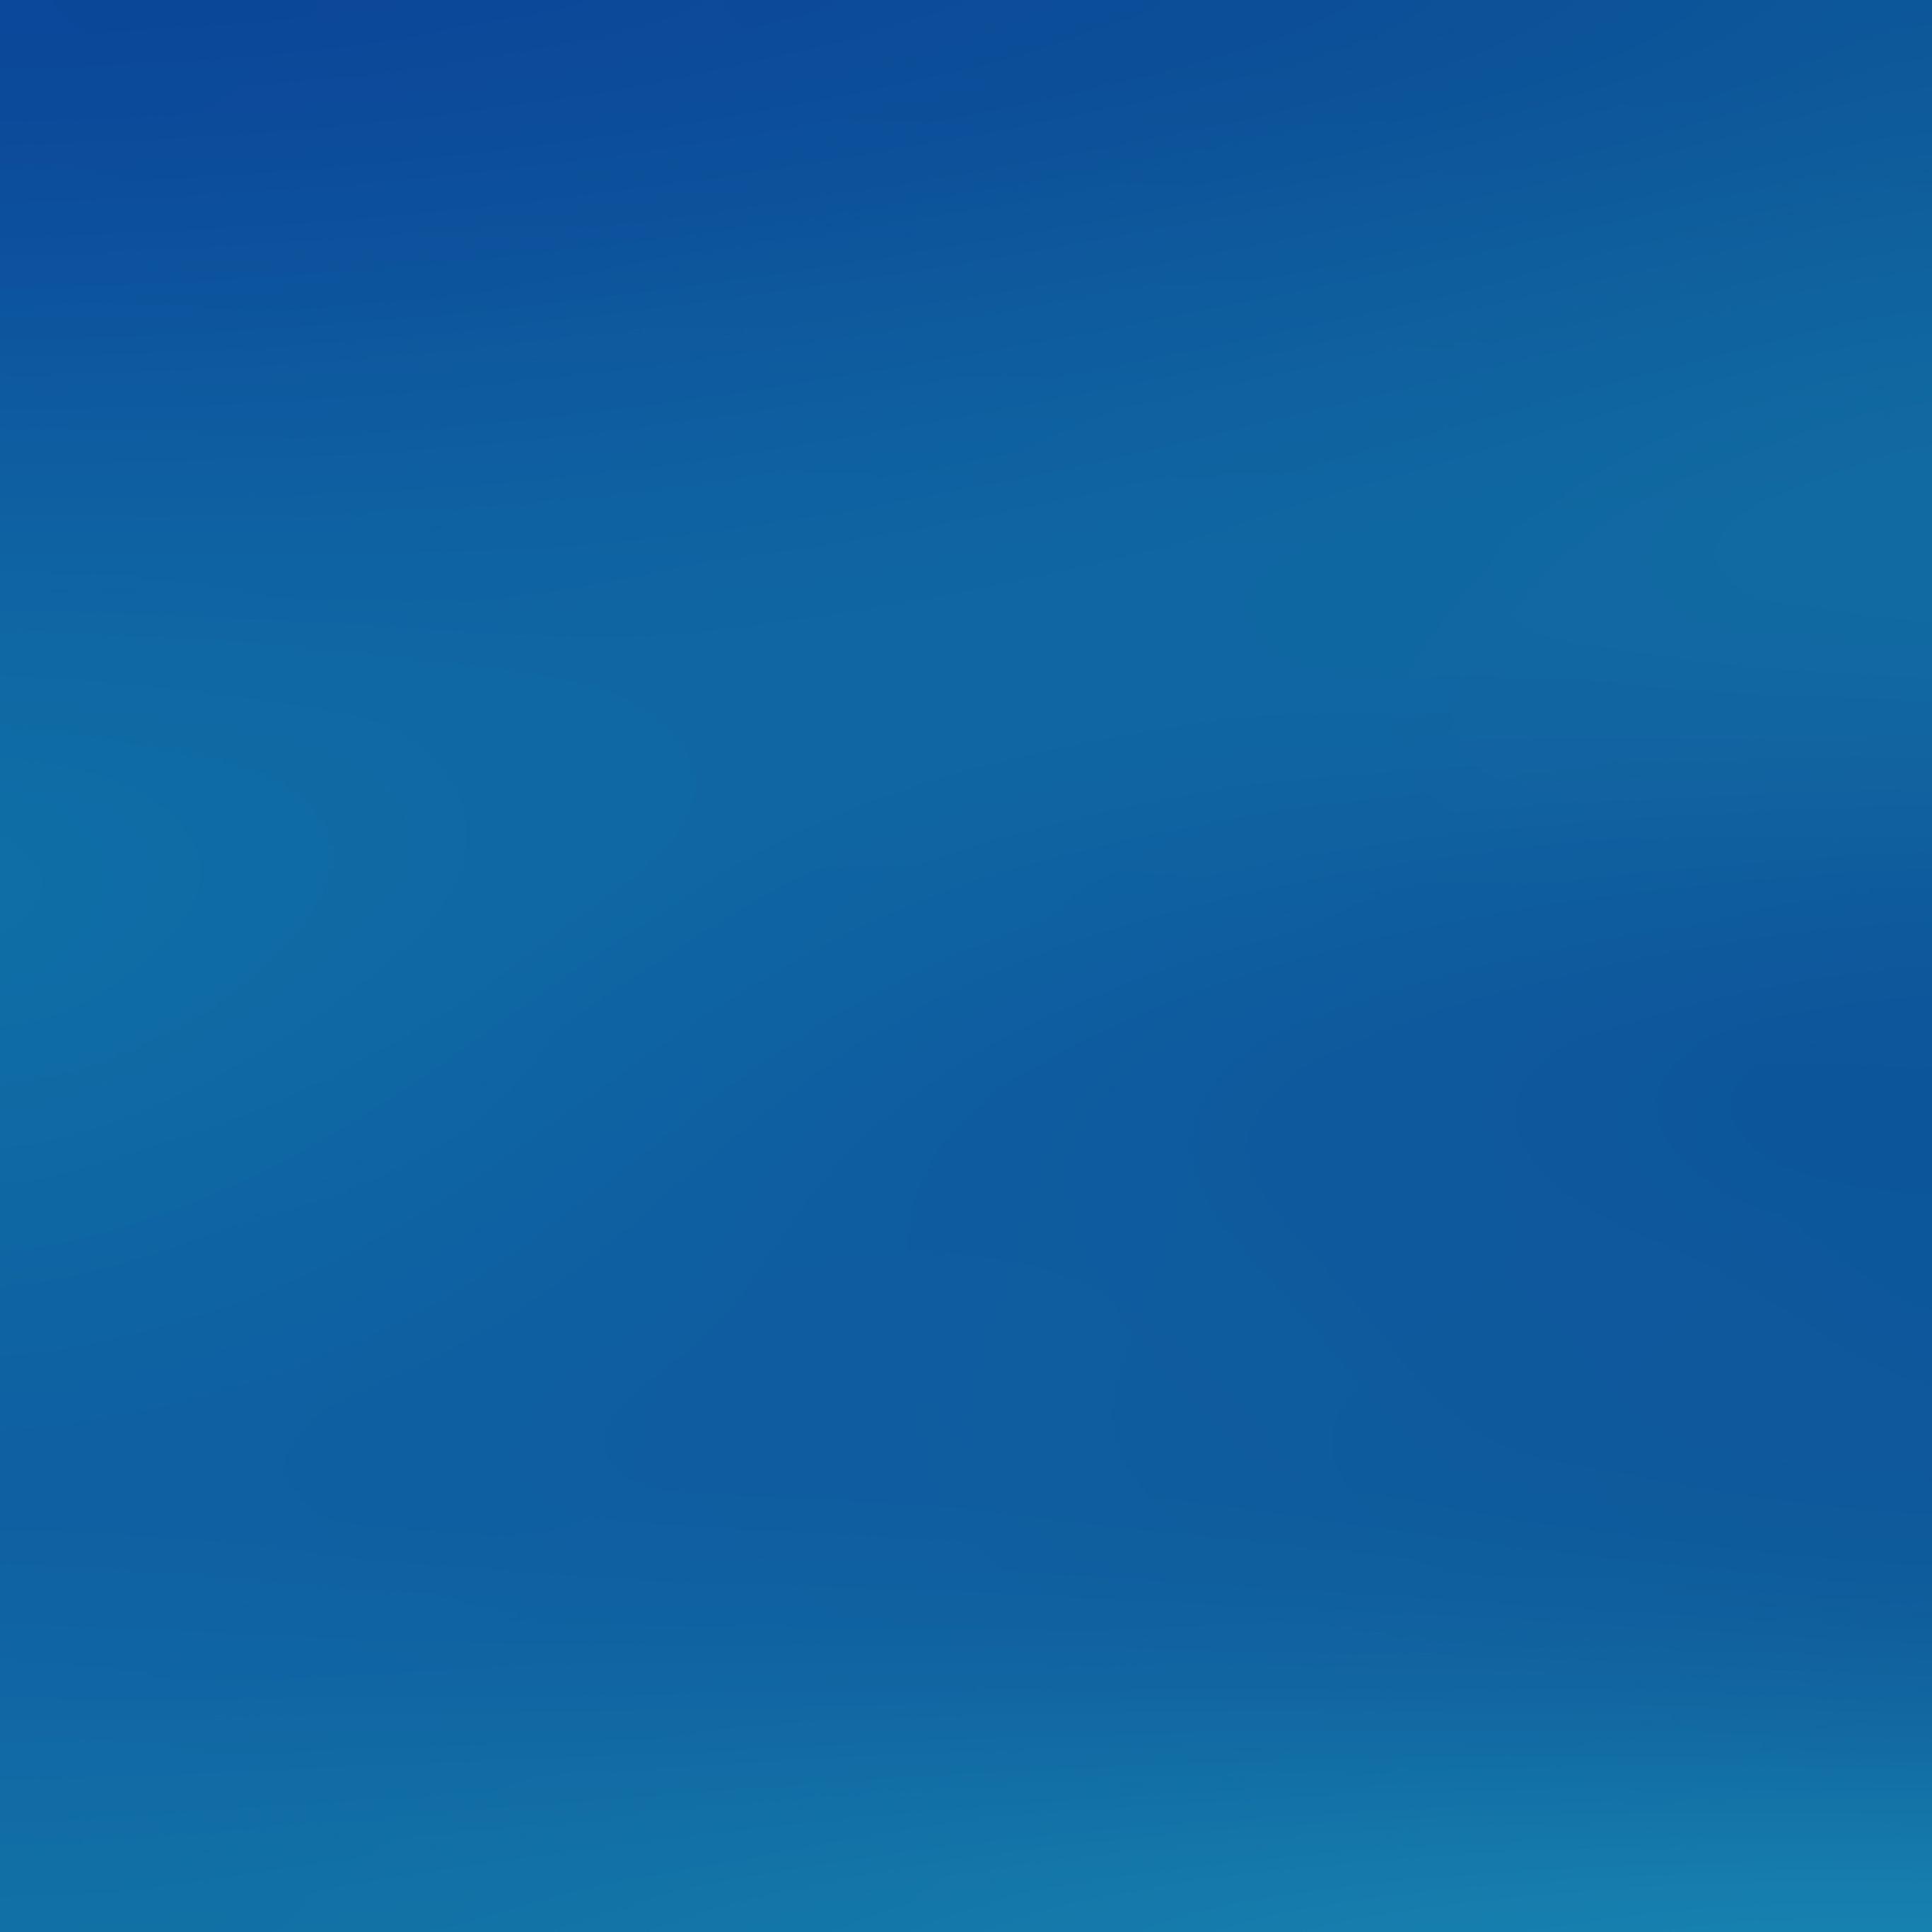 Royal Blue Dark Blue Wallpaper Hd For Android Ultra Hd Wallpaper 2020